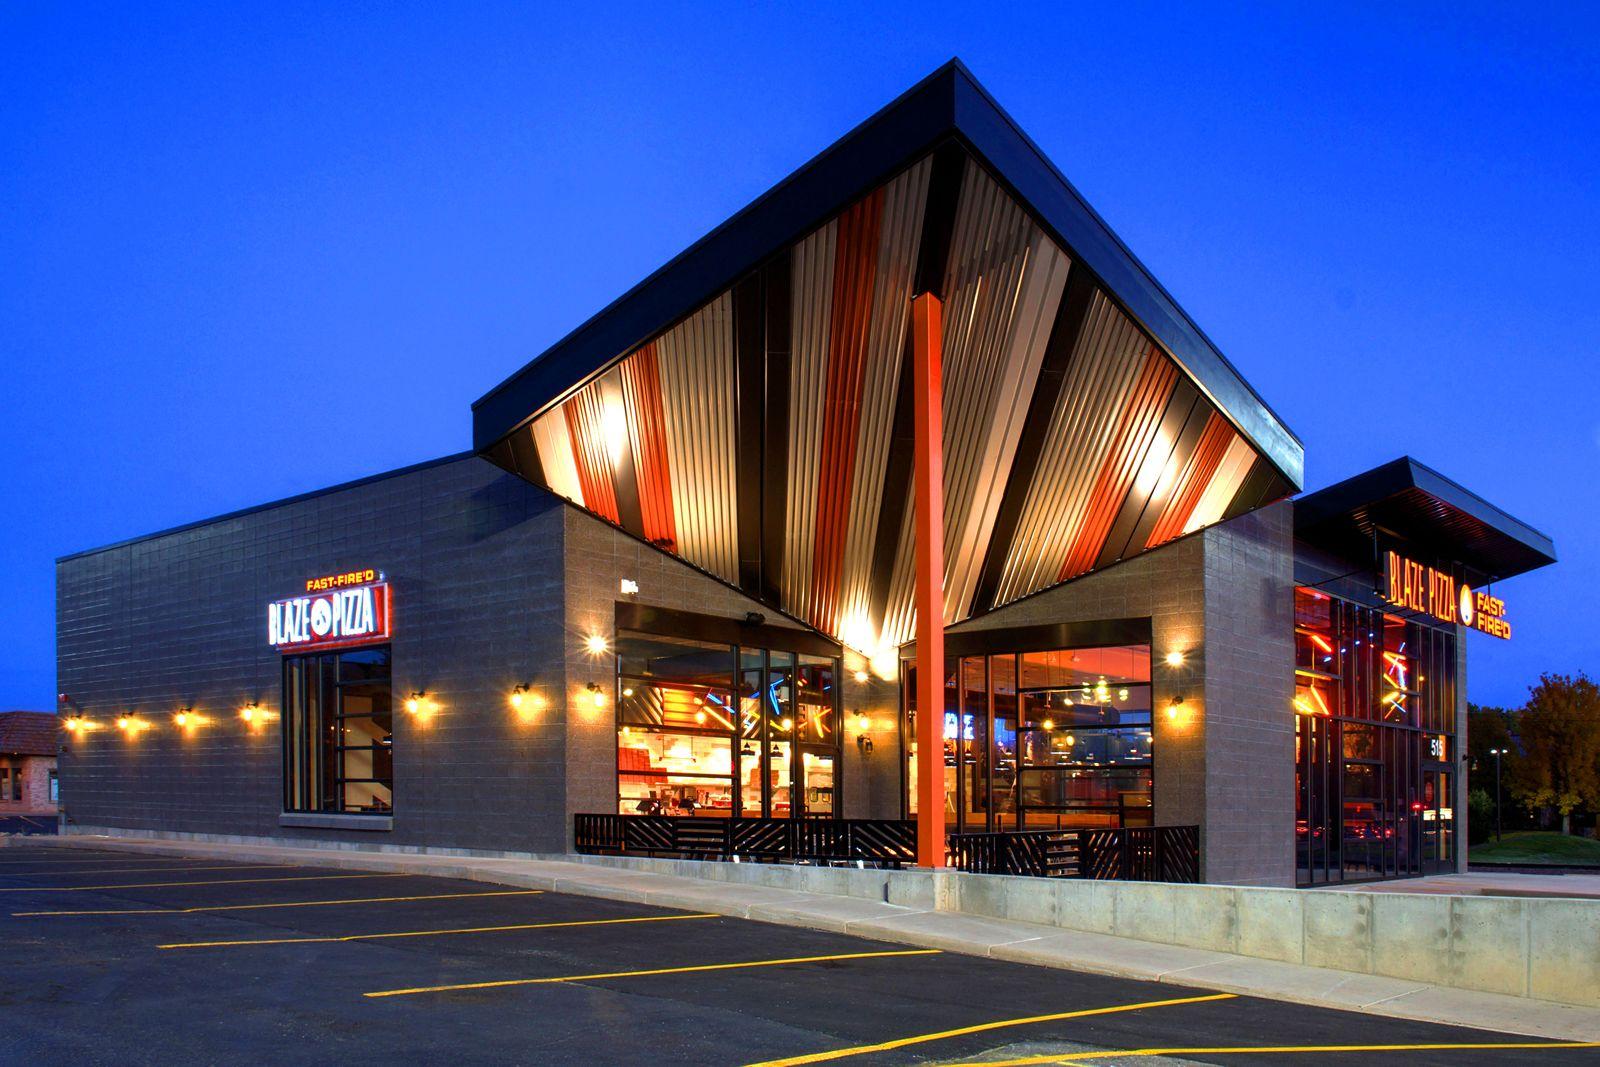 Blaze Fast-Fire'd Pizza Announces Strong Third Quarter 2017 Financial Results